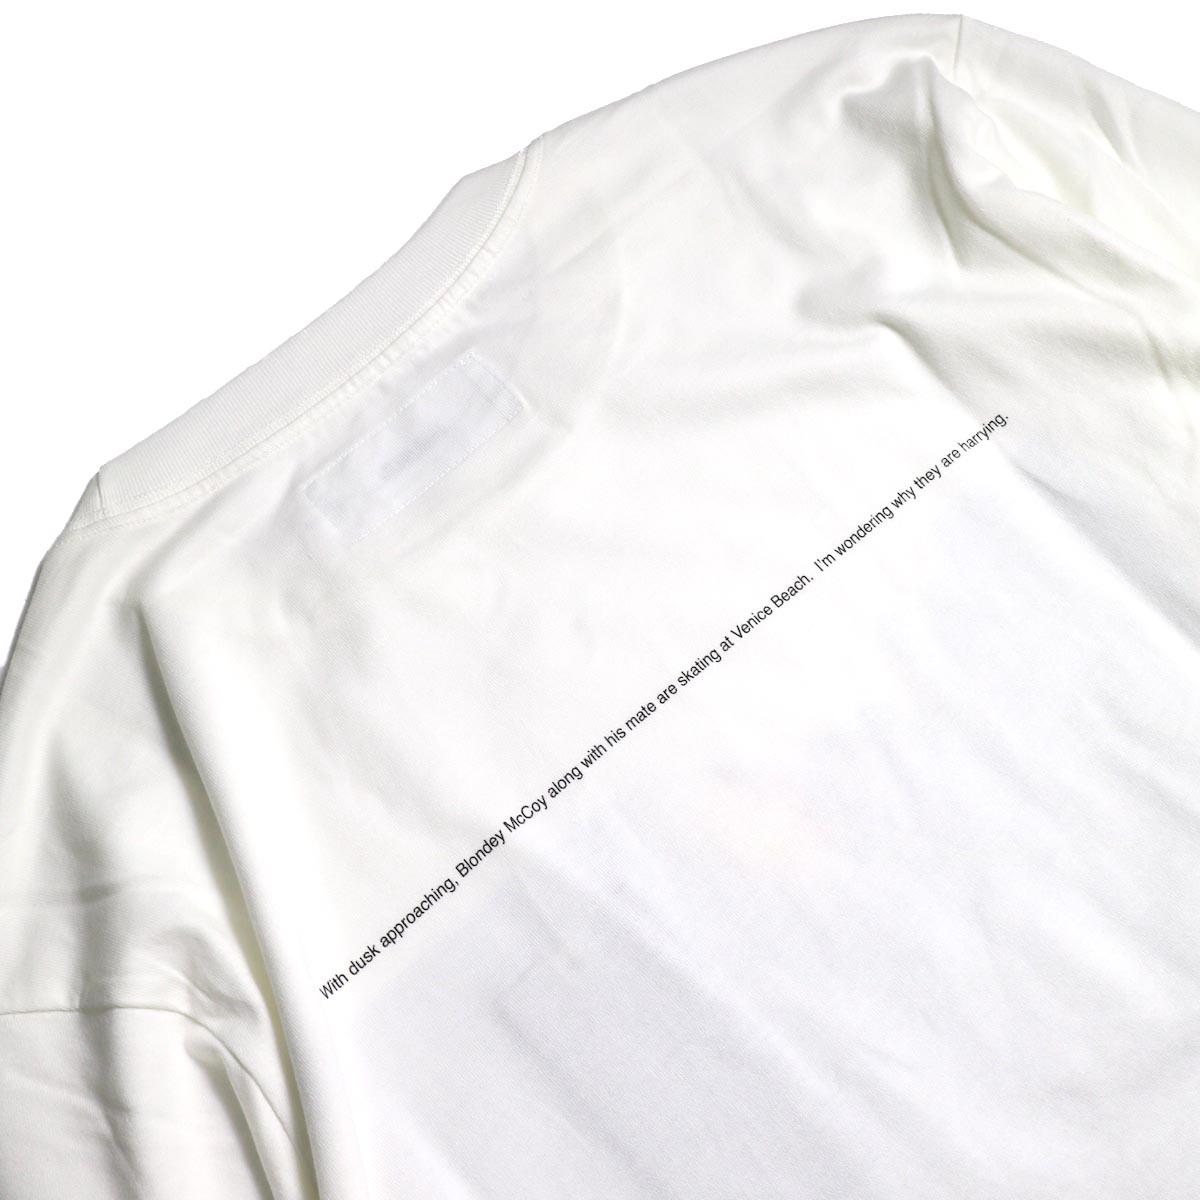 JANE SMITH / Print Tee (BLONDEY MCCOY L/S) -White背面プリント